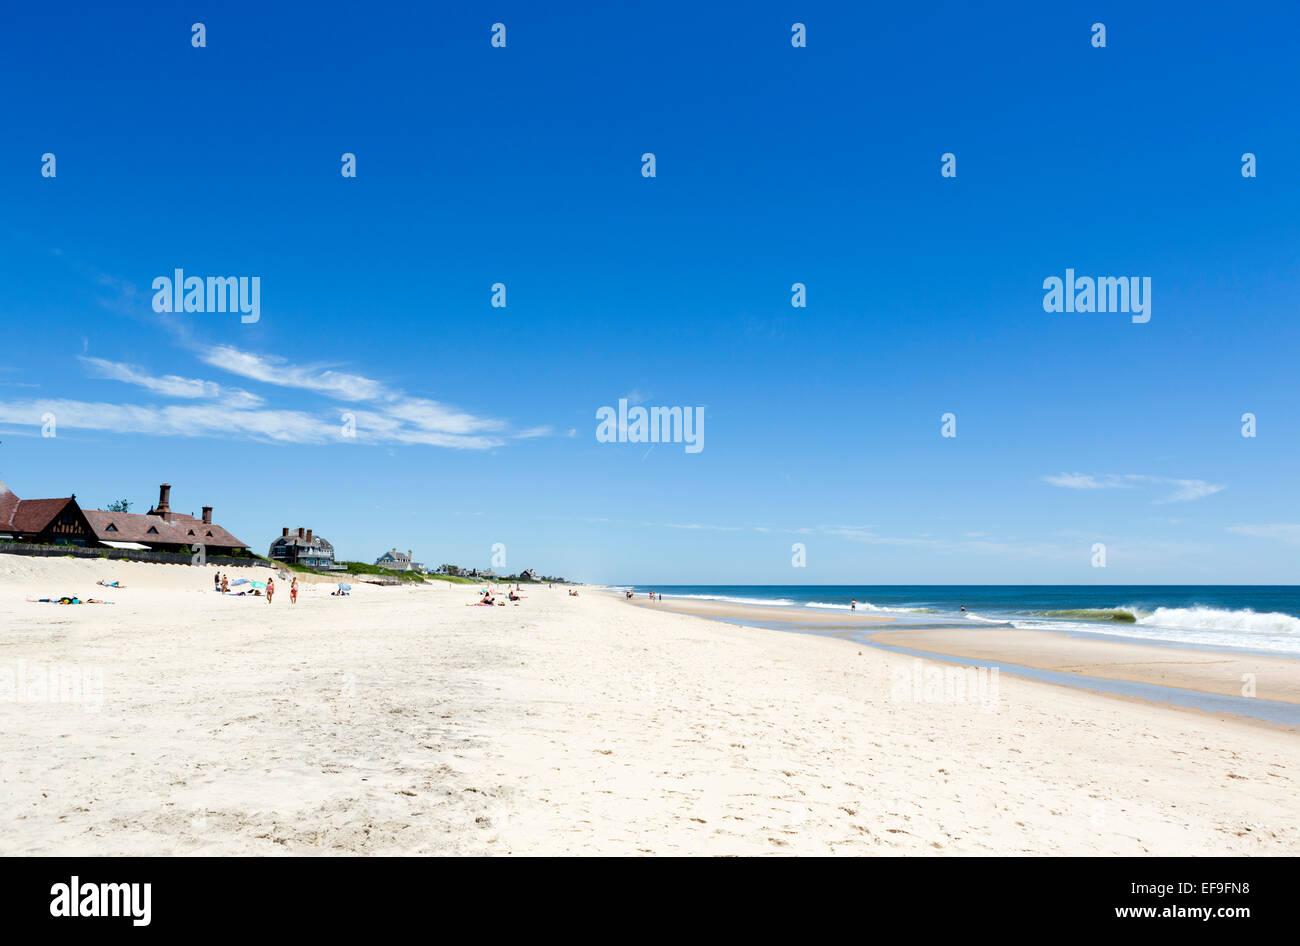 Beach at Southampton, The Hamptons, Suffolk County, Long Island , NY, USA - Stock Image